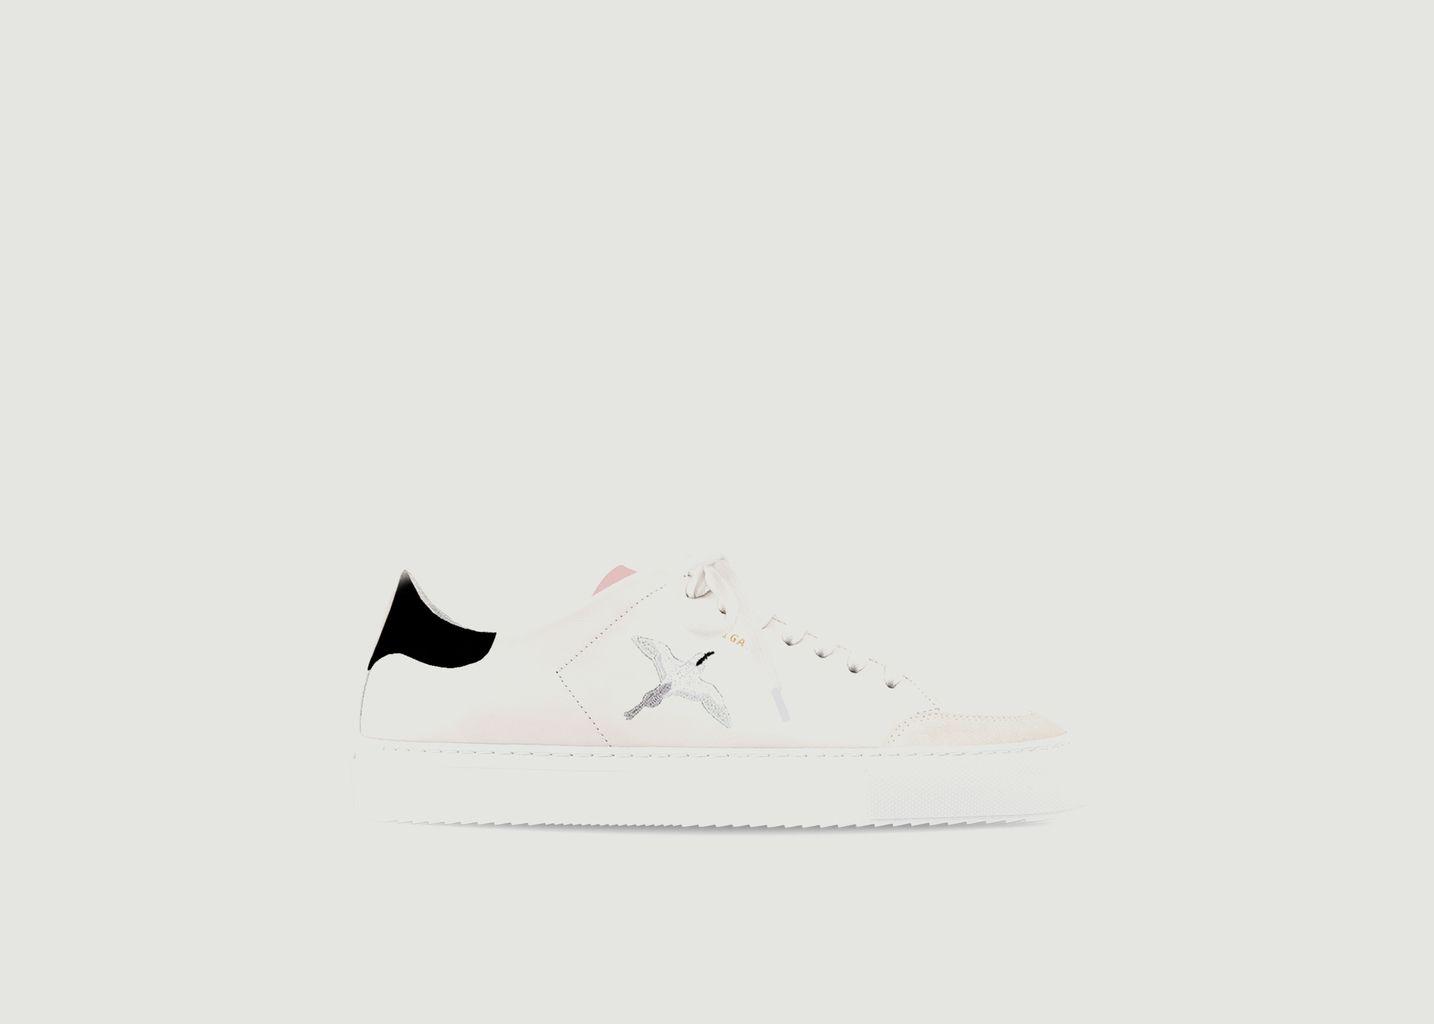 Sneakers Clean 90 Triple Bird - Axel Arigato